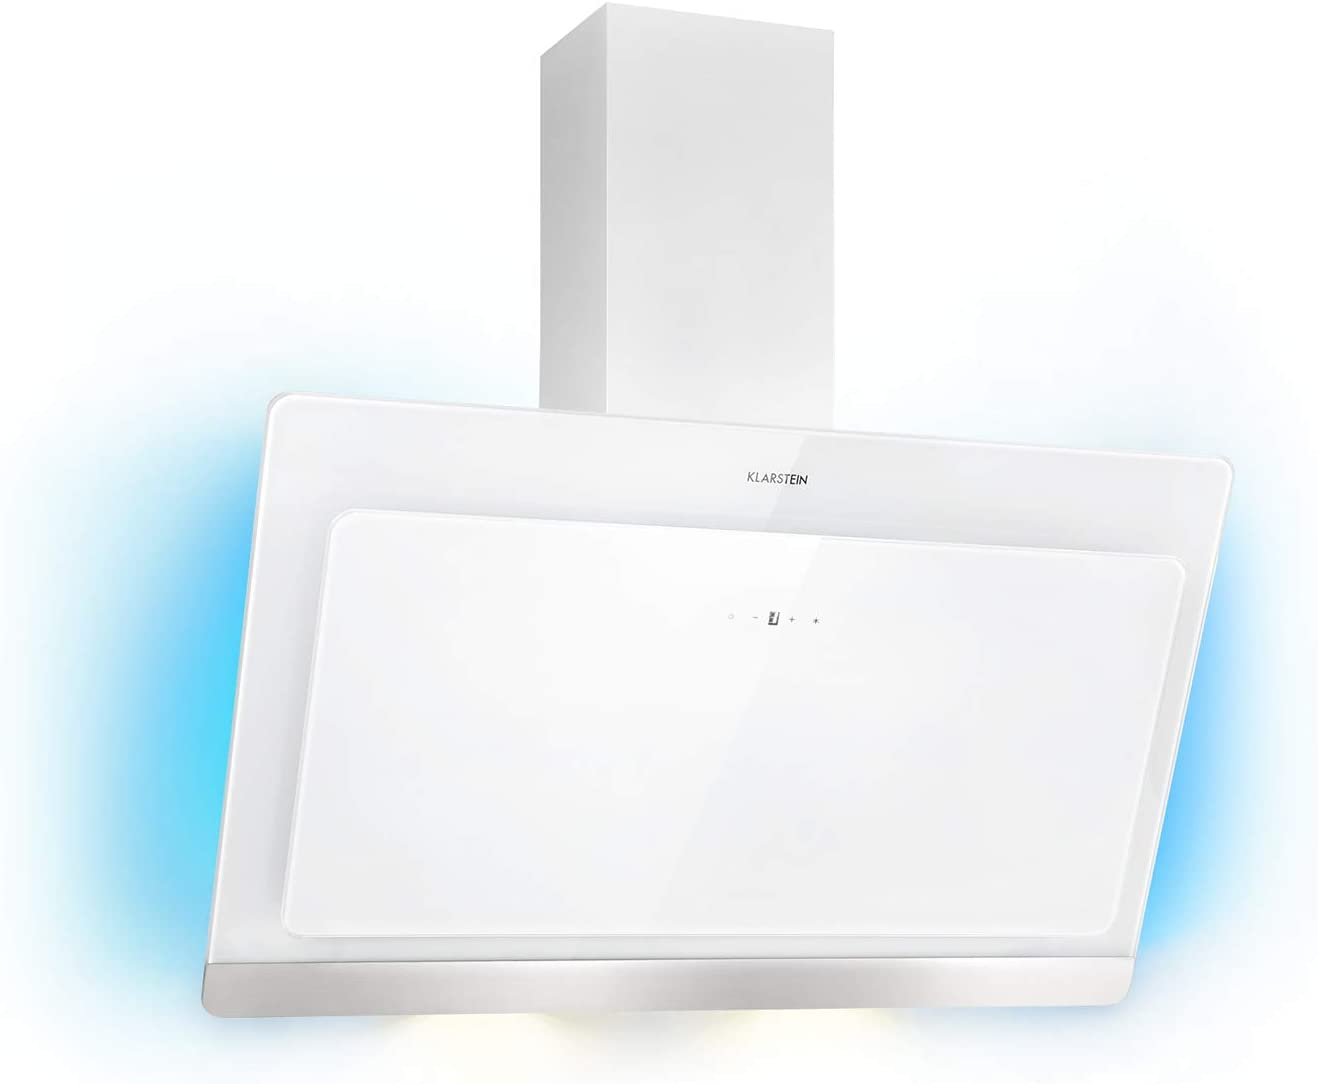 KLARSTEIN Aurora Eco 90 - Campana extractora, 550 m³/h, Bajo Consumo, Eco Excellence, Display LED, Balanced Light Concept, 3 Niveles, Diseño Compacto, Clase fluidodinámica A, Blanco